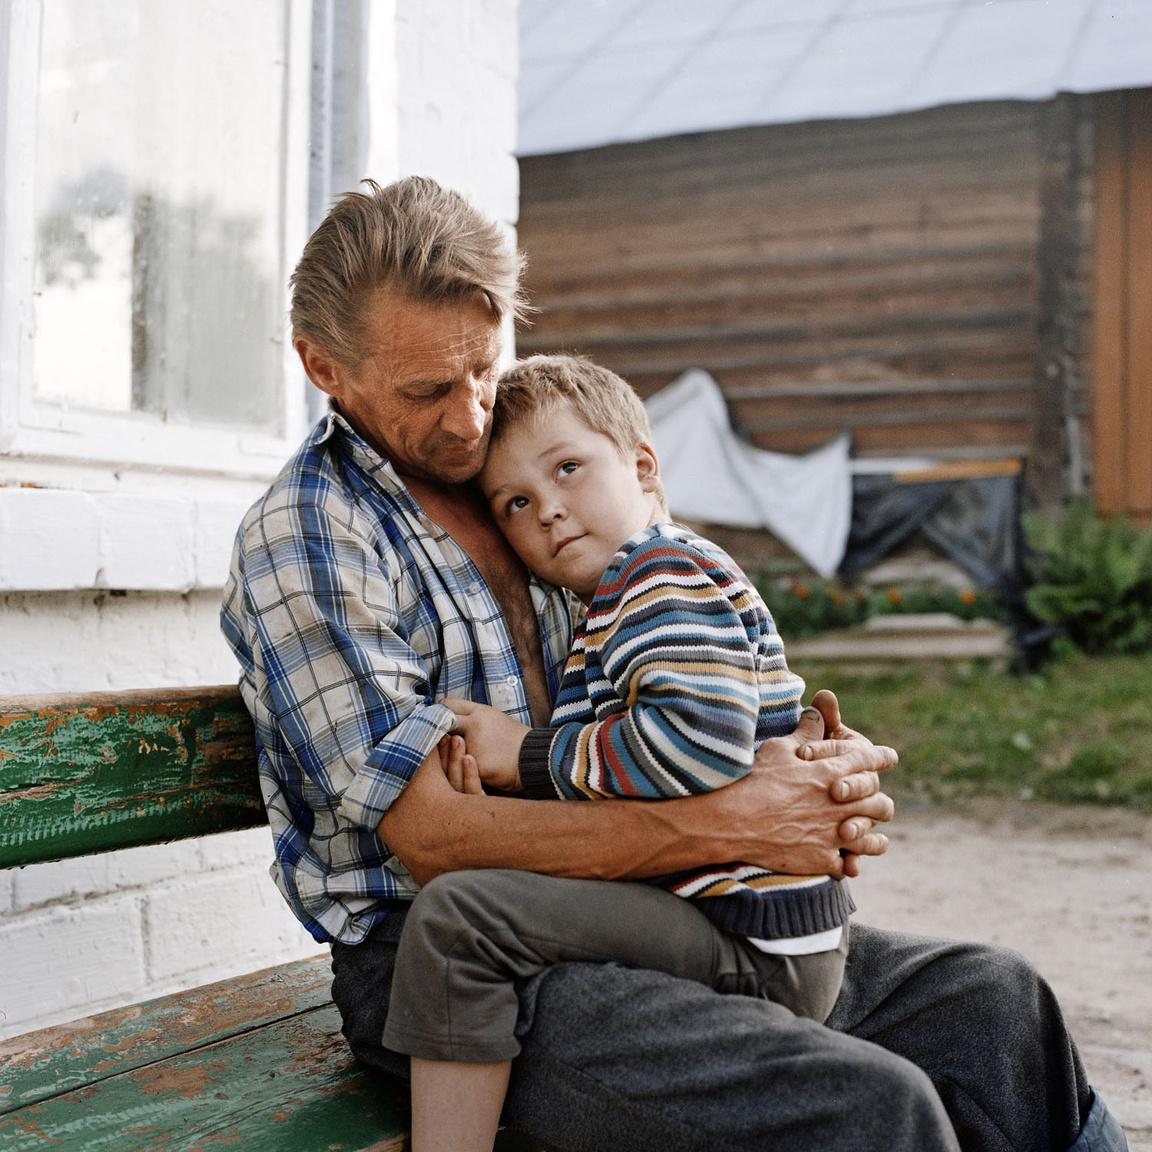 Karolcik és az apja, Stanislav.